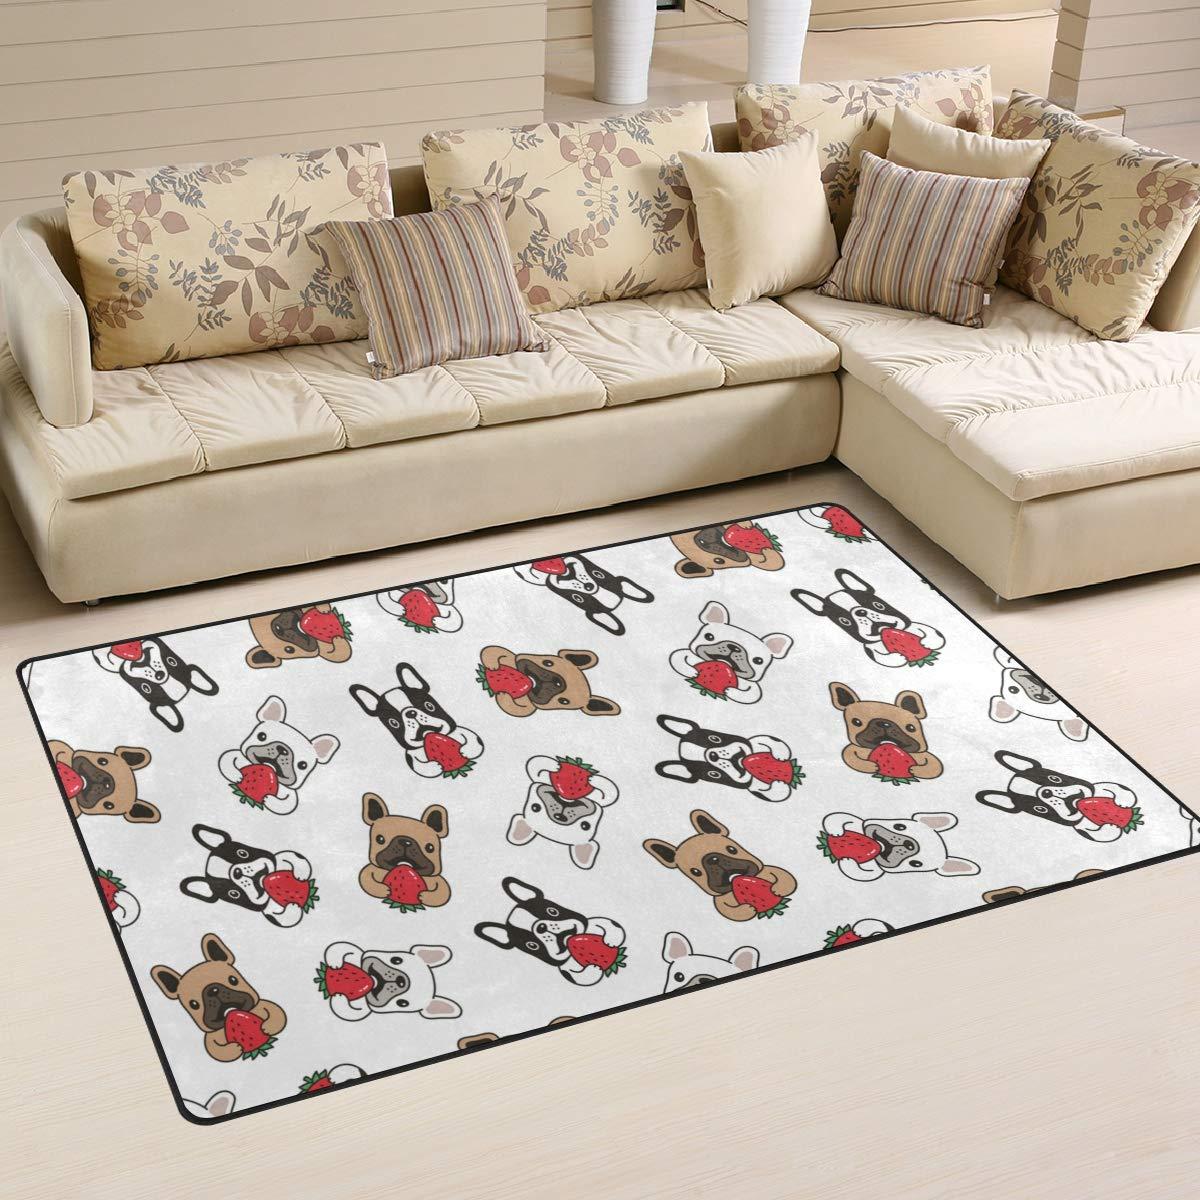 ALAZA Dog French Bulldog Strawberry Cartoon Non Slip Area Rug 2' x 3', Modern Floor Rugs Mat for Living Room Bedroom Dinning Room Home Decor